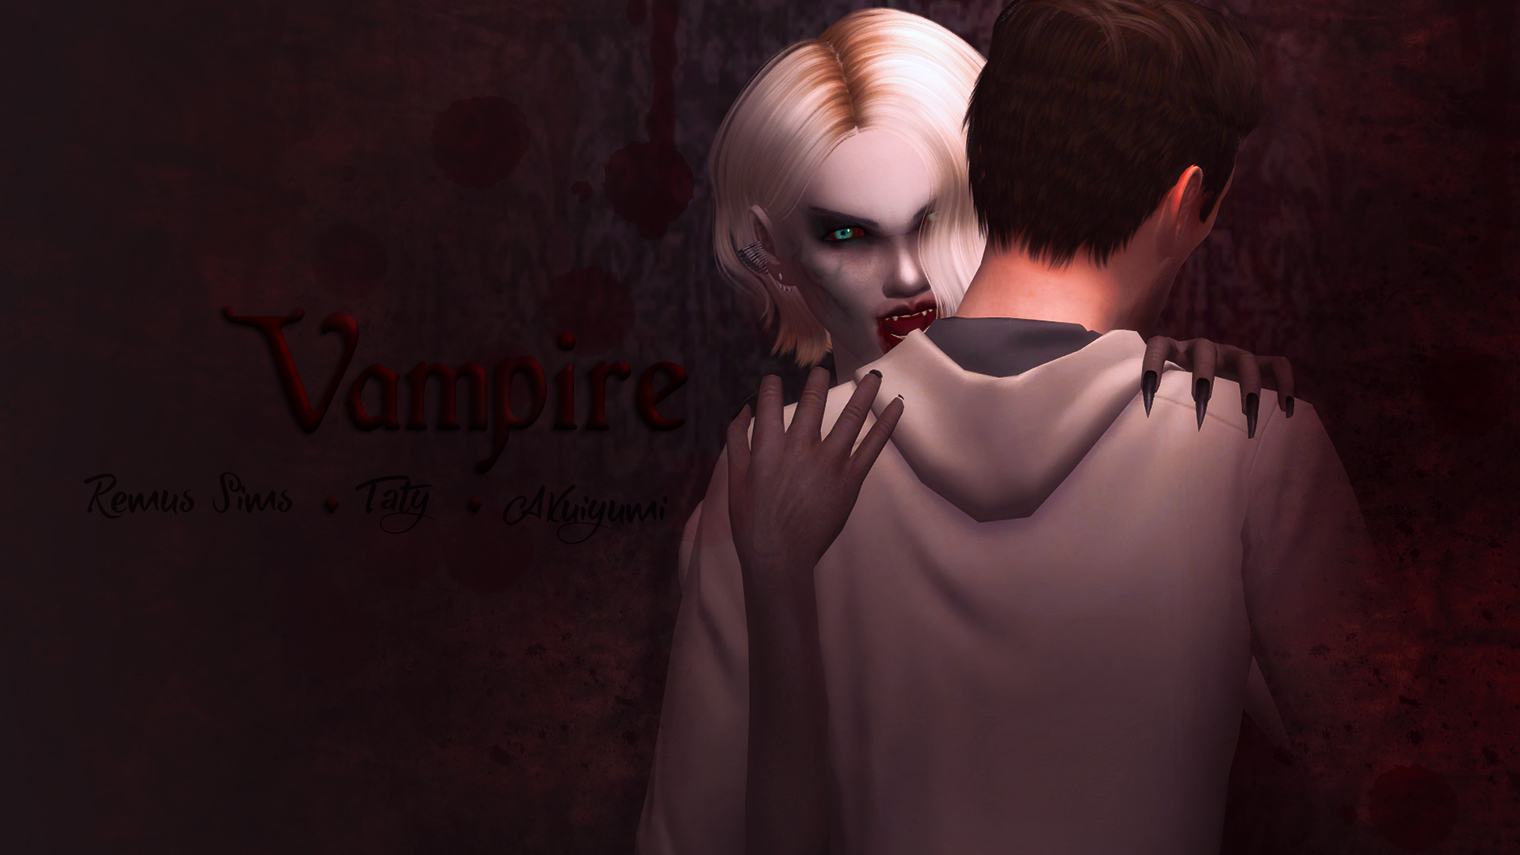 Vampire poses